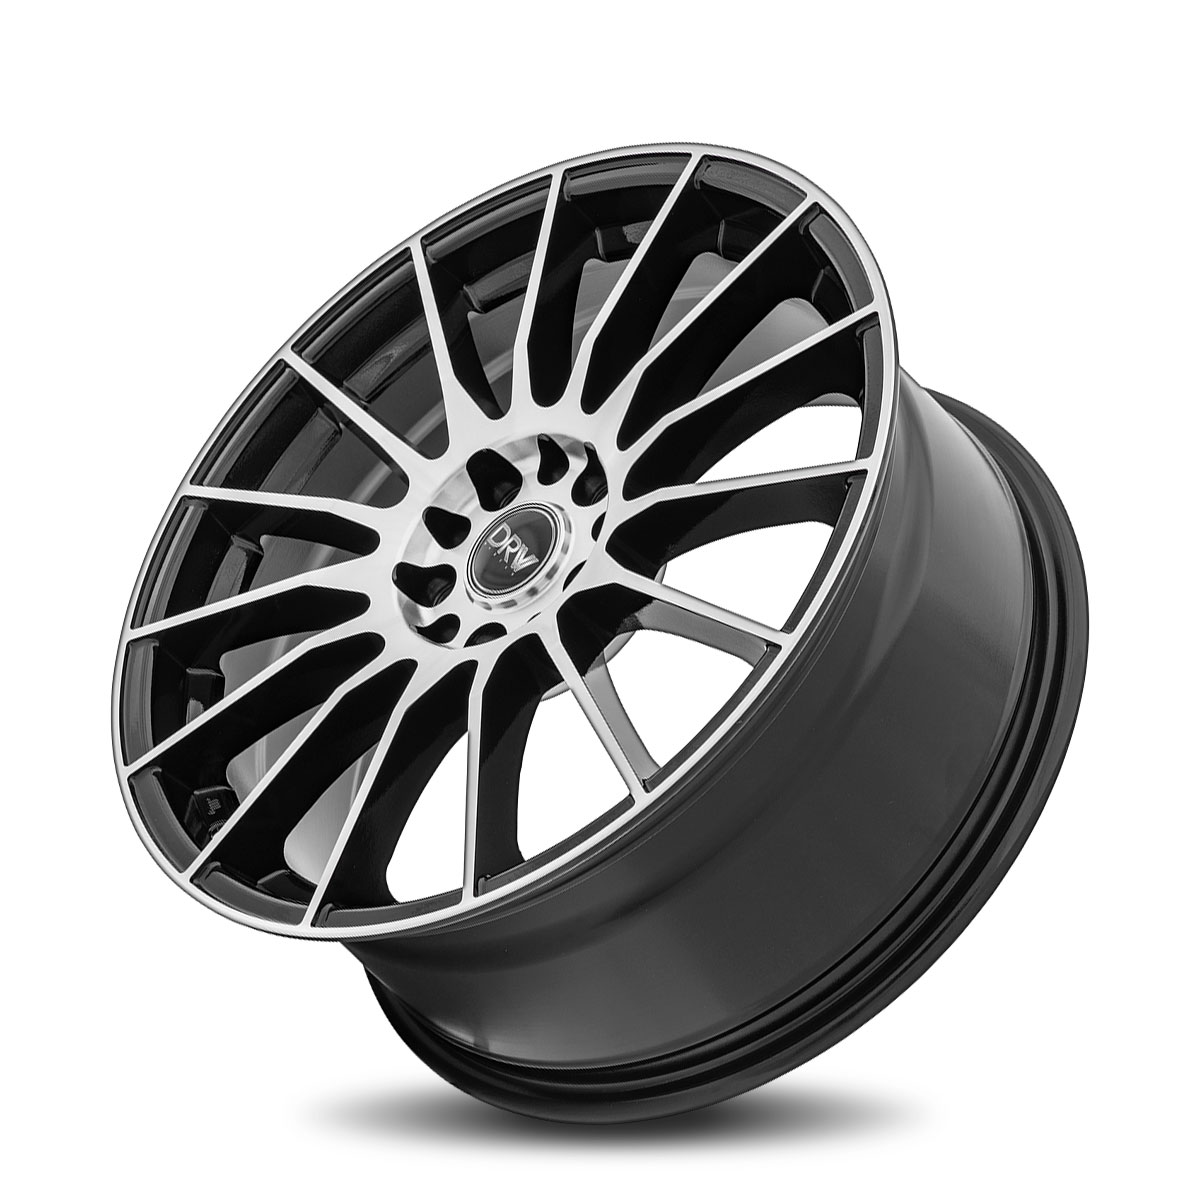 Diablo Racing Wheels DRW D15 - Gloss Black Machined Face Rim